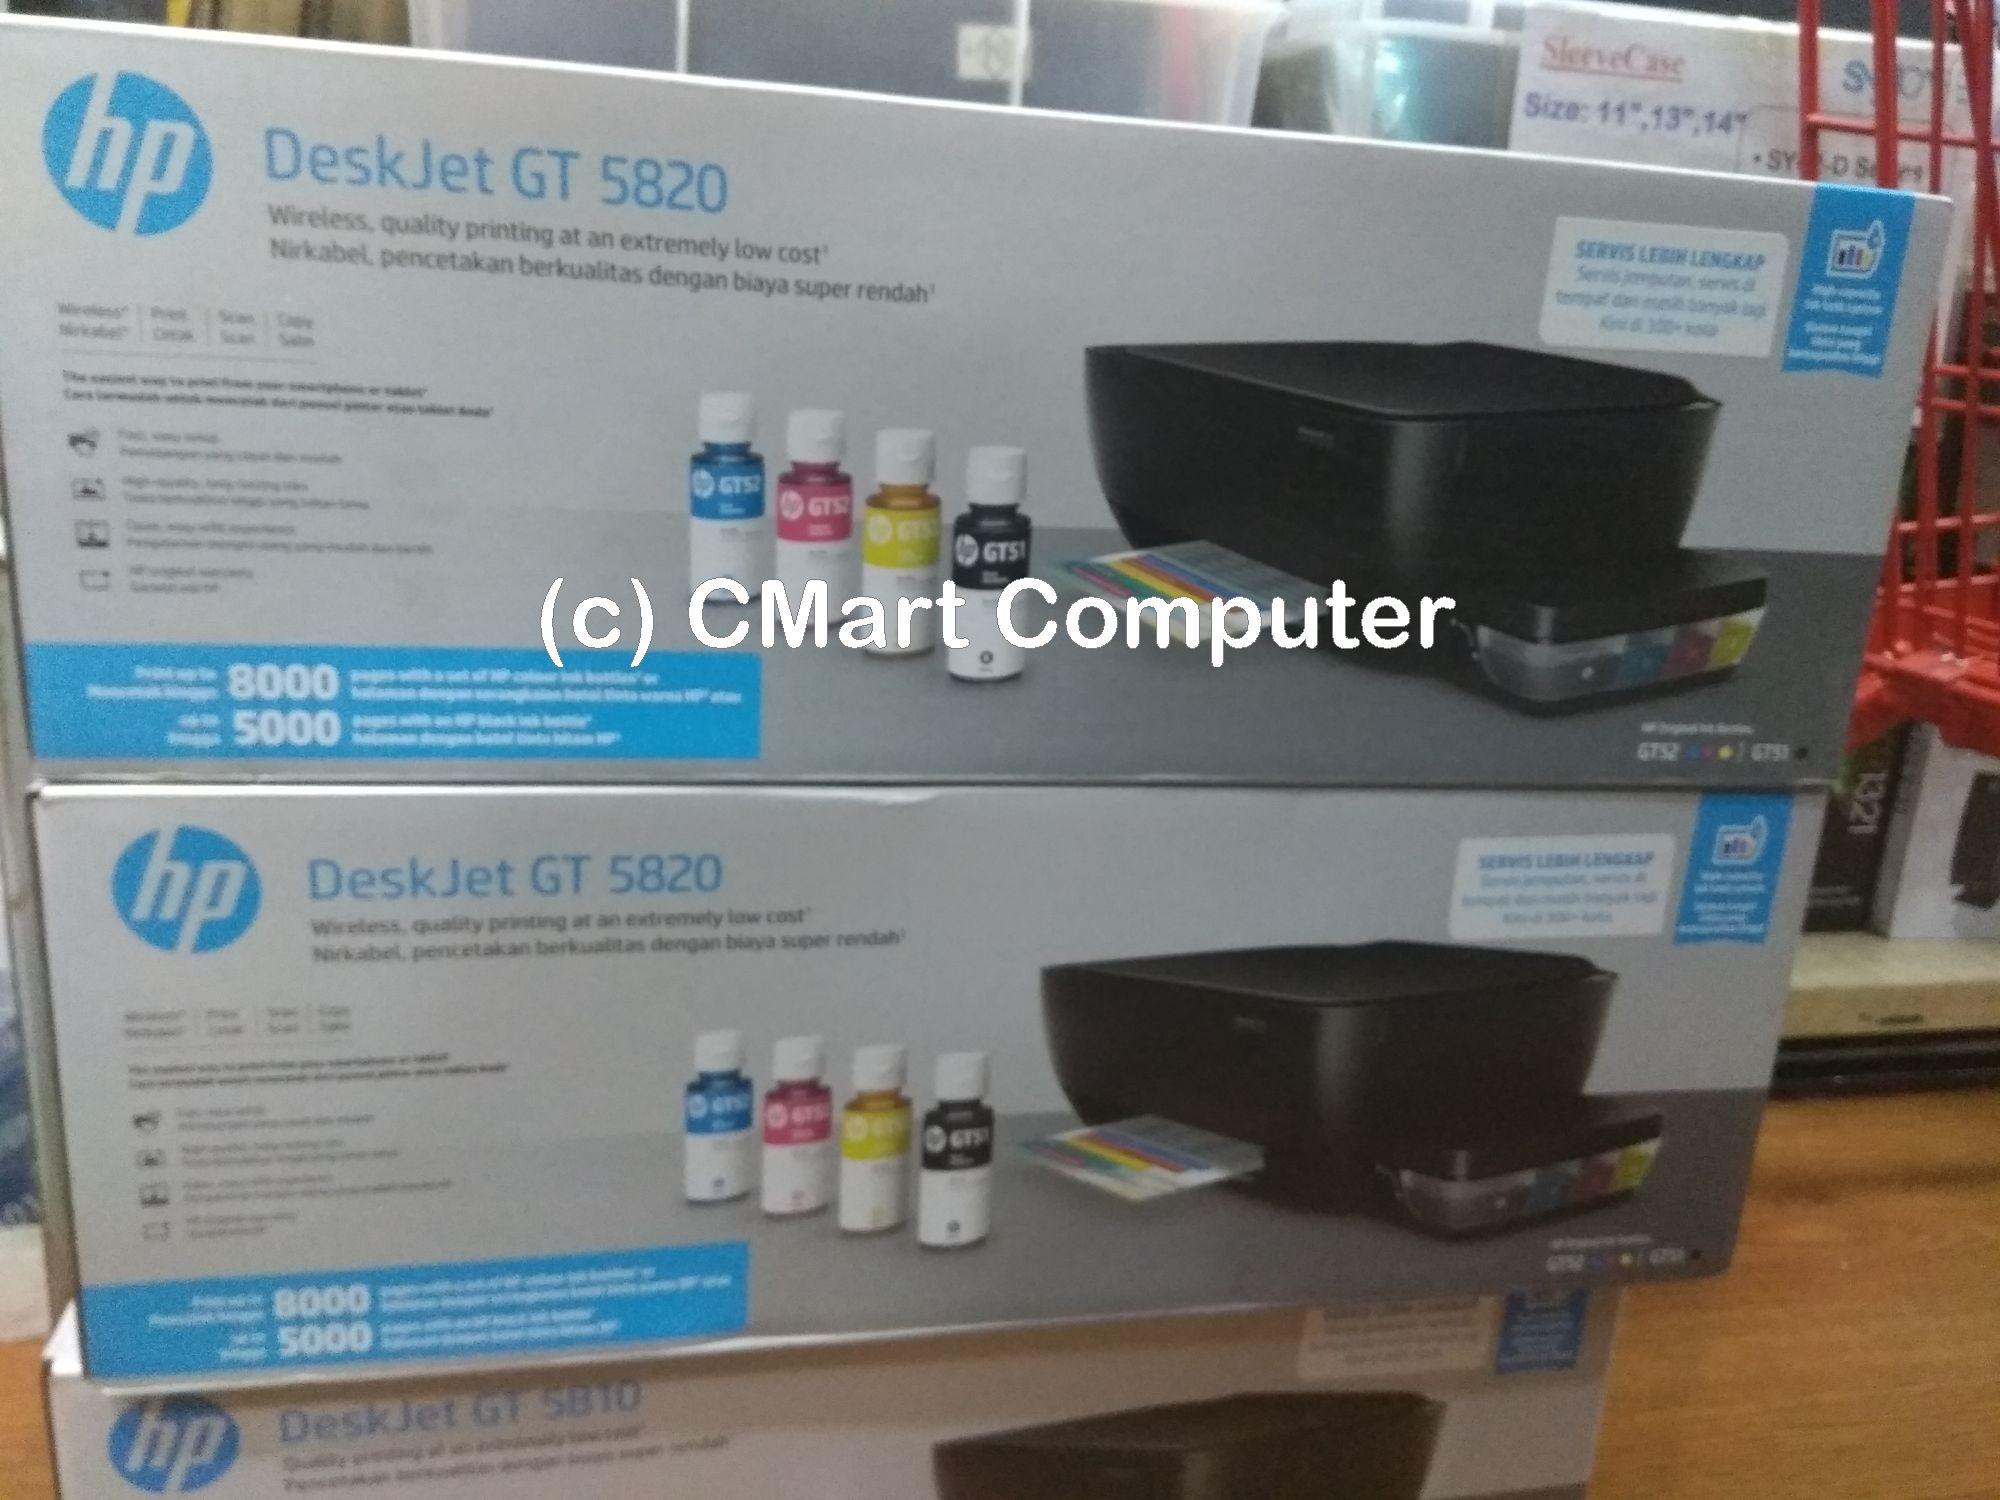 Hp Deskjet Gt 5810 All In One Printer Hitam Daftar Harga Terkini Tinta Original Gt51 Black M0h57a 90ml Refill Gt5810 5820 Jual Gt5820 Cmart Computer